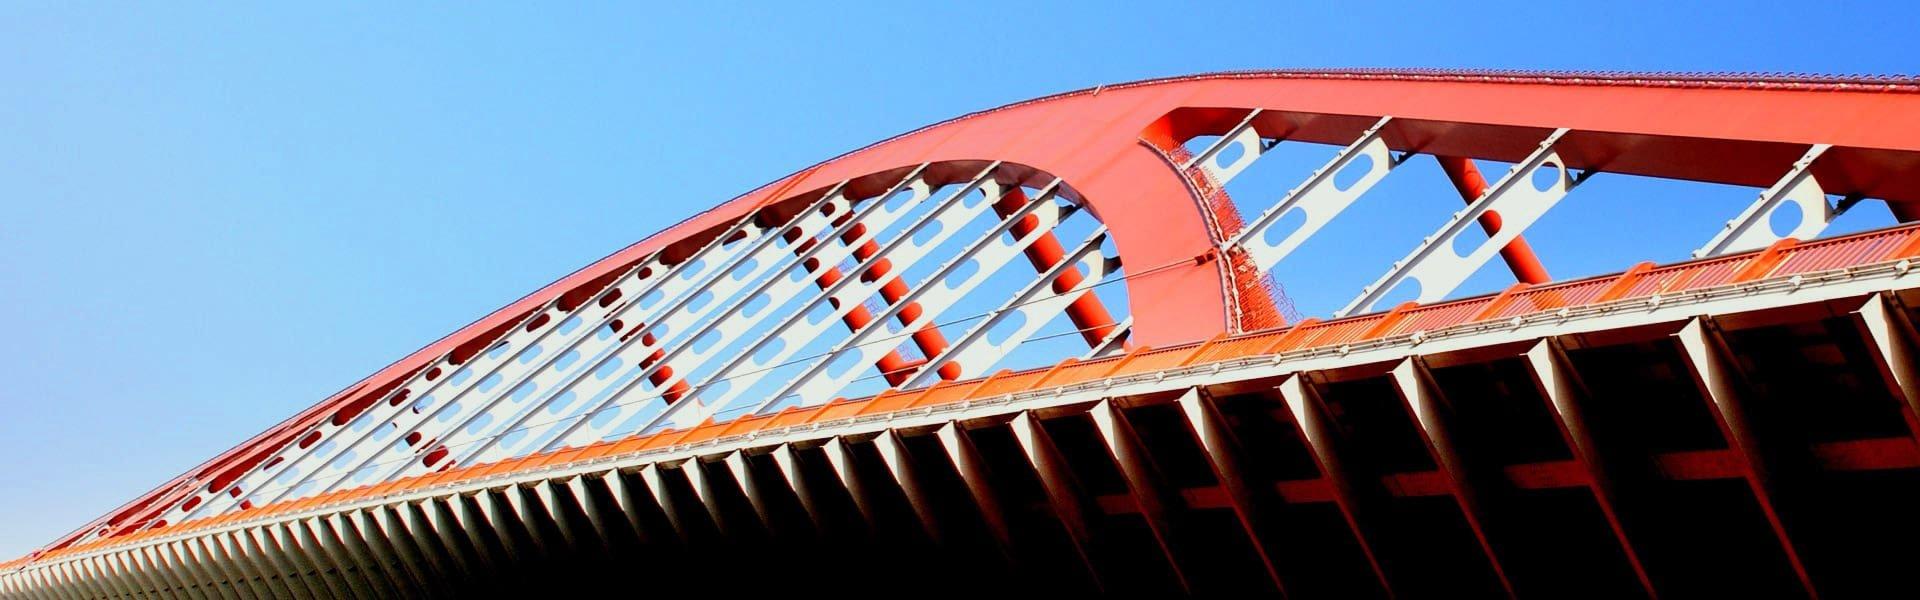 Energy and Infrastructure Coatings Sector – Bridge Coatings